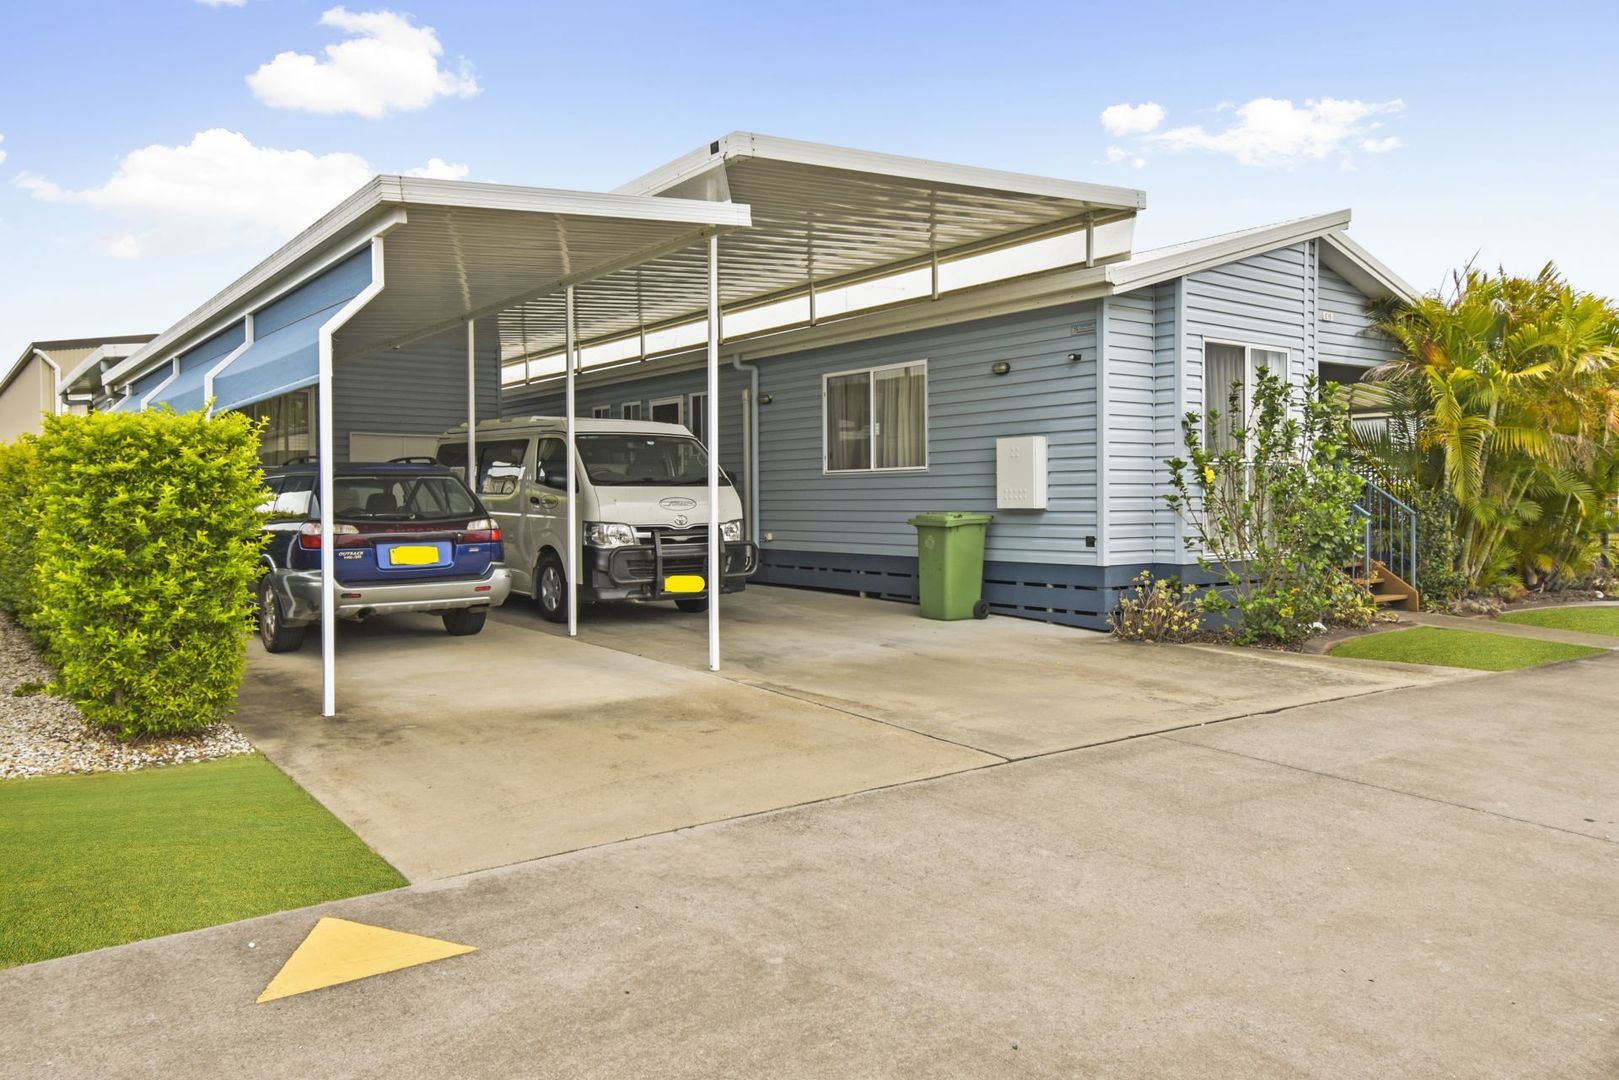 15 Wagtail Way/69 Light Street, Casino NSW 2470, Image 0